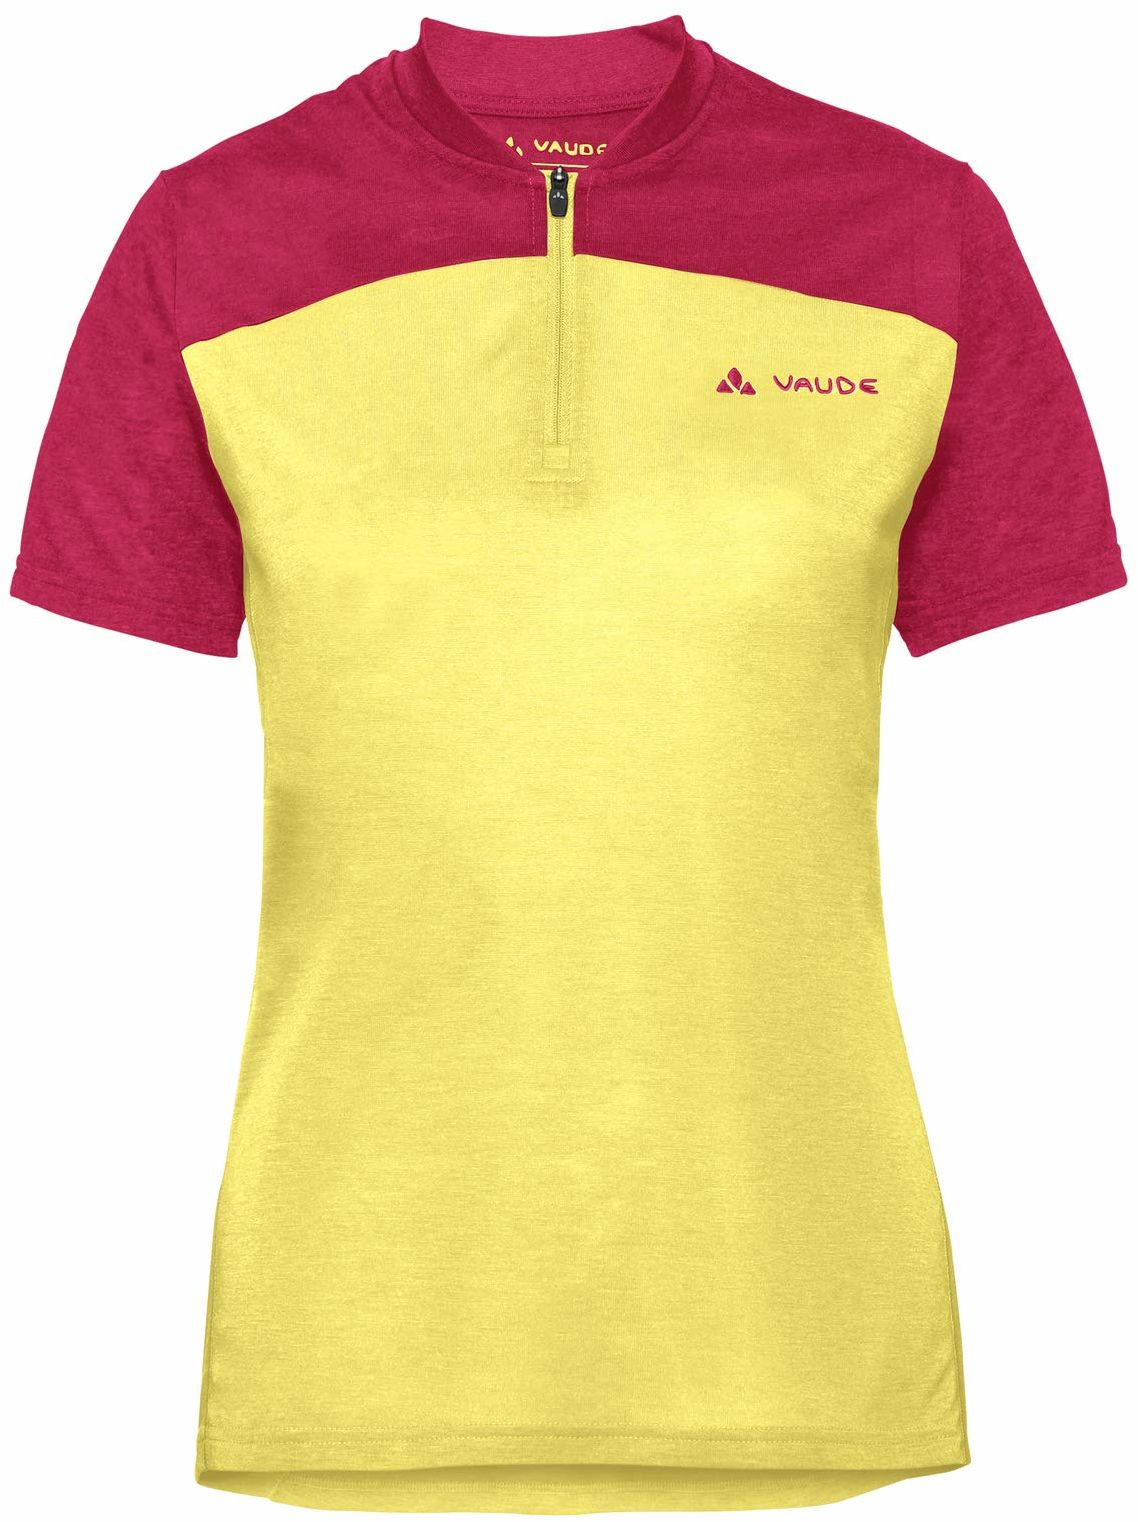 VAUDE Tremalzo koszulka damska żółty Mimosa 34